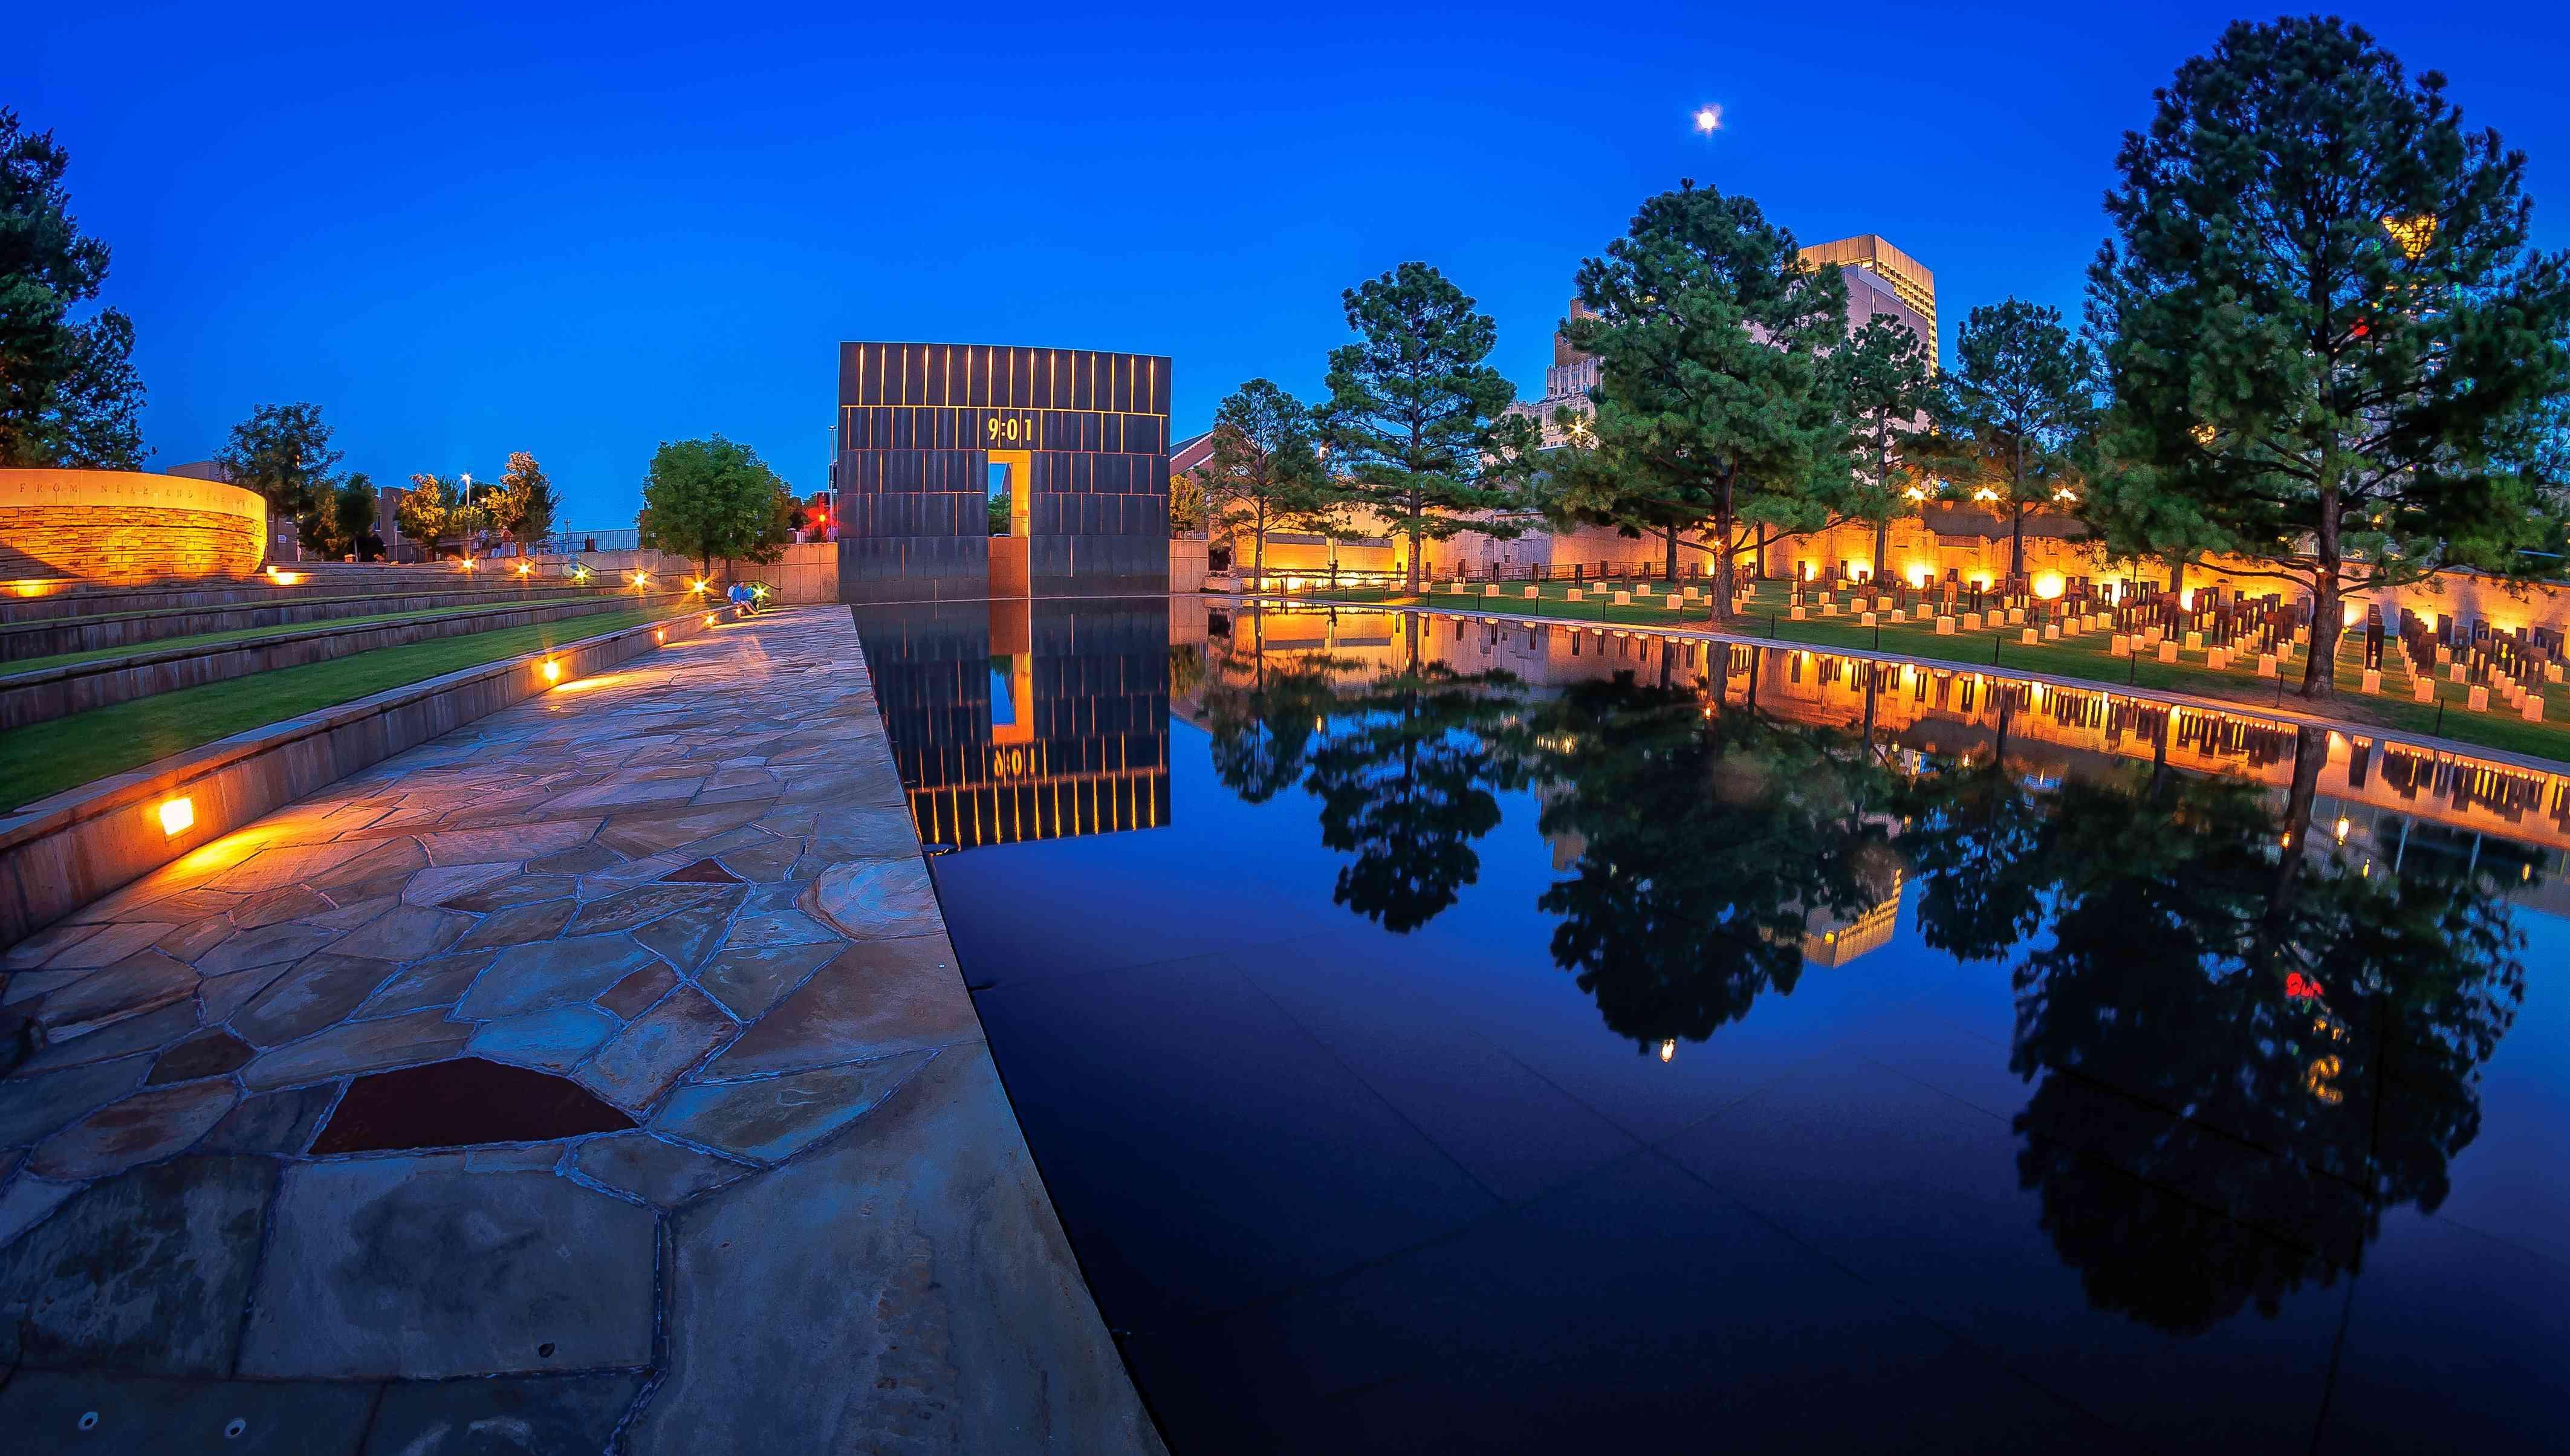 Reflecting pool of the Oklahoma City National Memorial at night